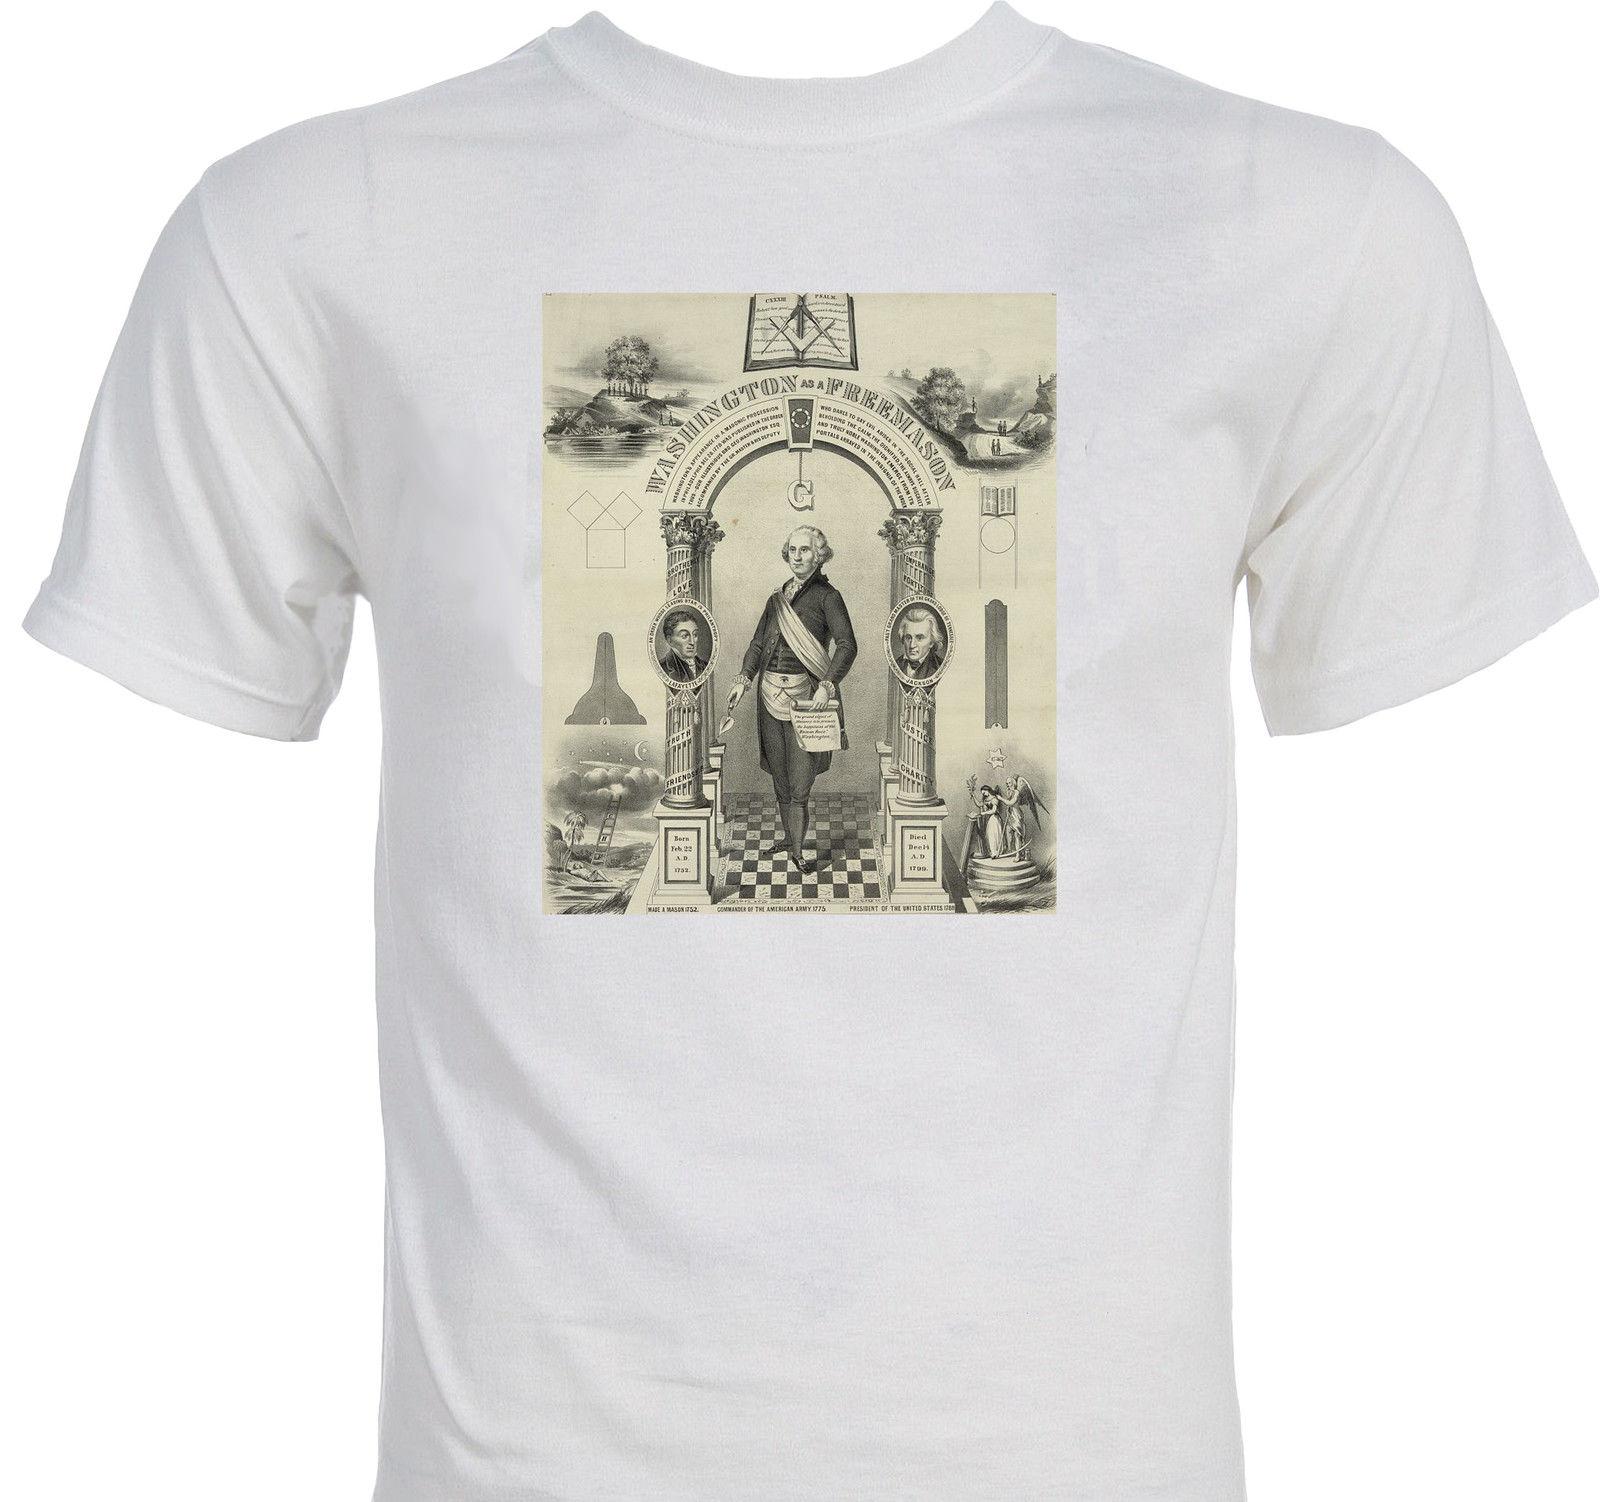 2019 Brand New Men Clothing Fashion T Shirts George Washington As Freemason  Occult Freemasonry Conspiracy Theory Hipster Tee